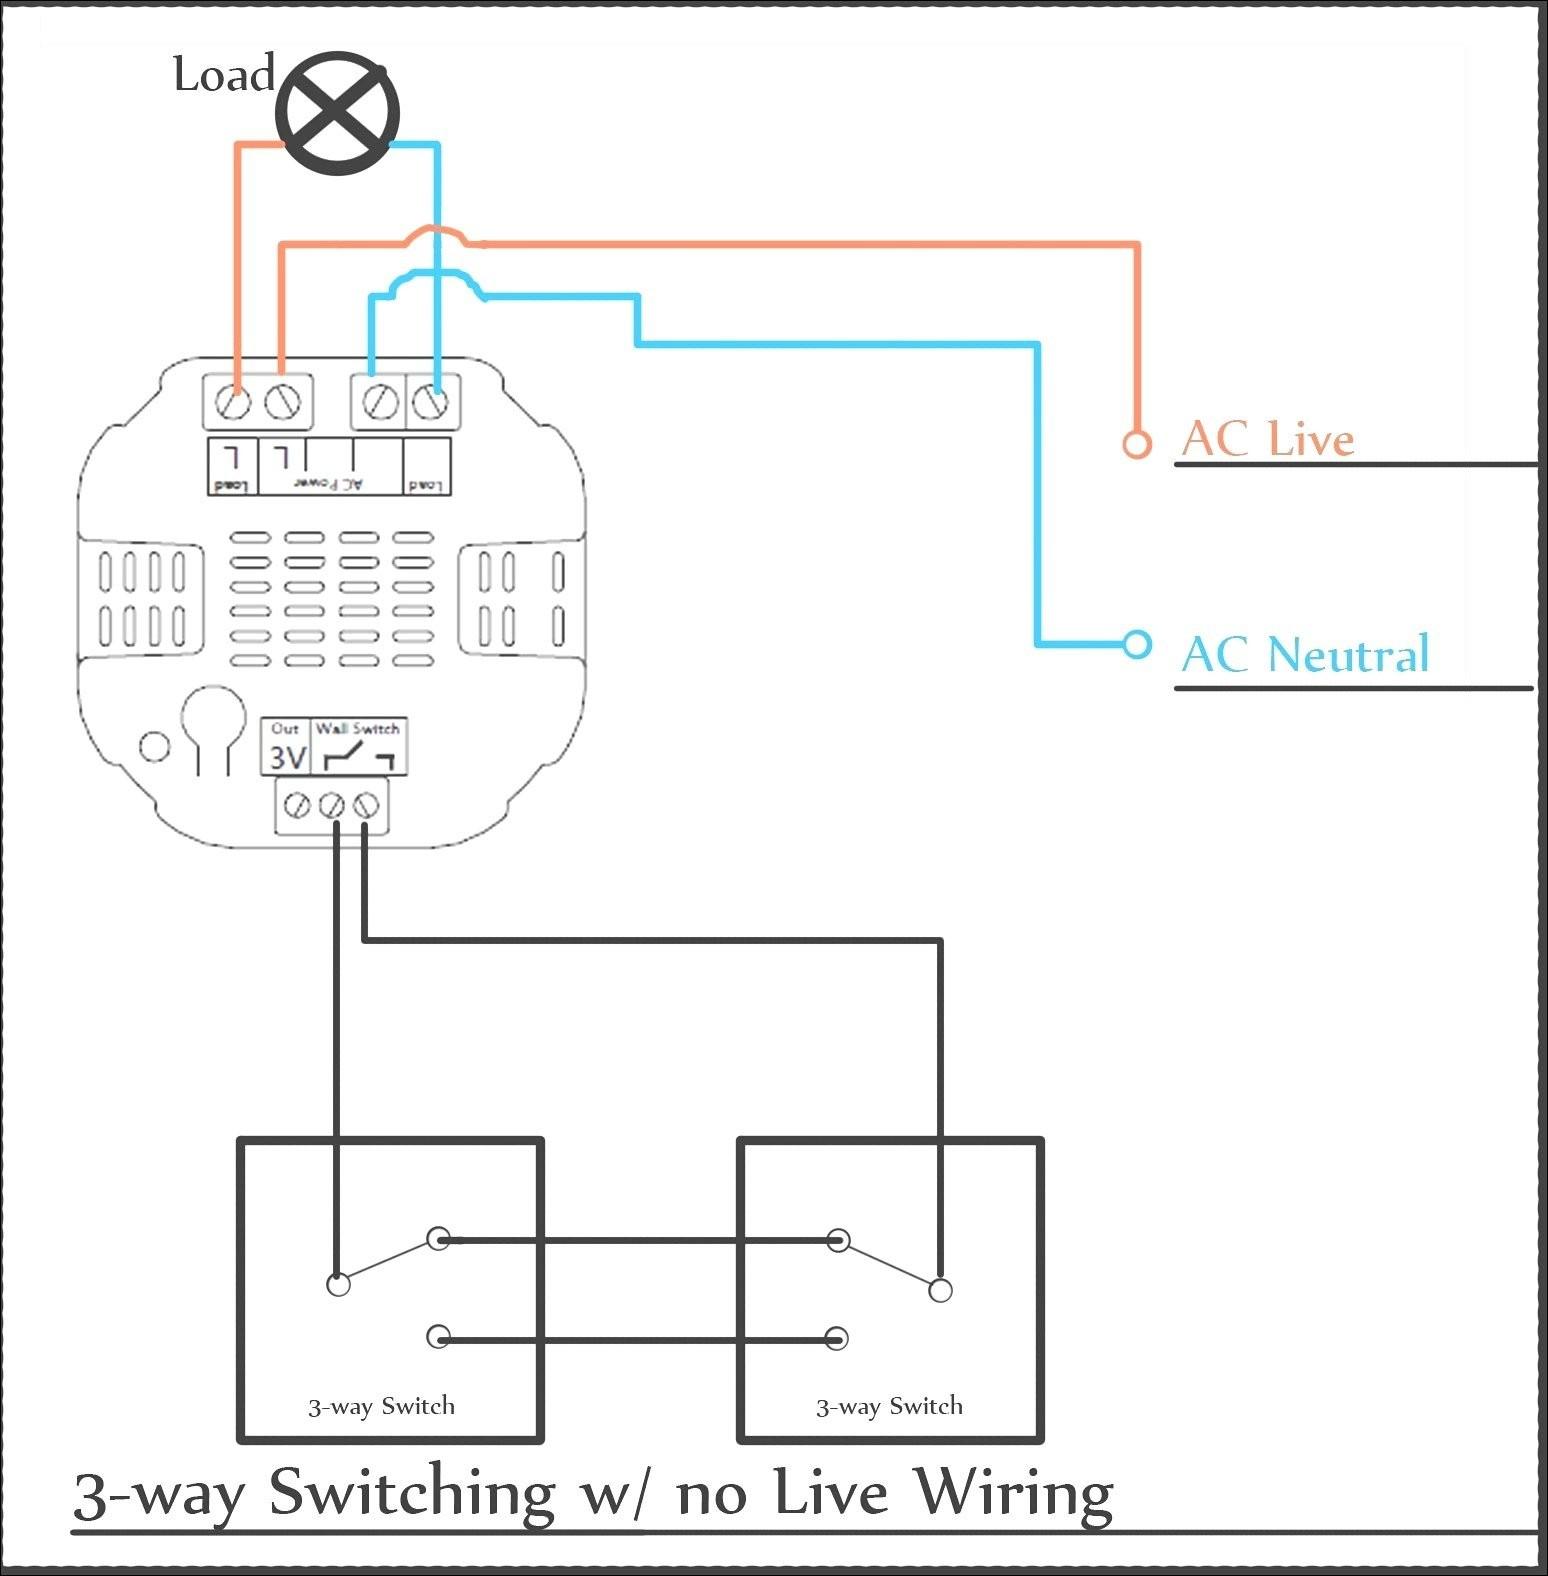 Leviton 3 Way Switch Wiring Diagram Decora That photograph Zing Ear